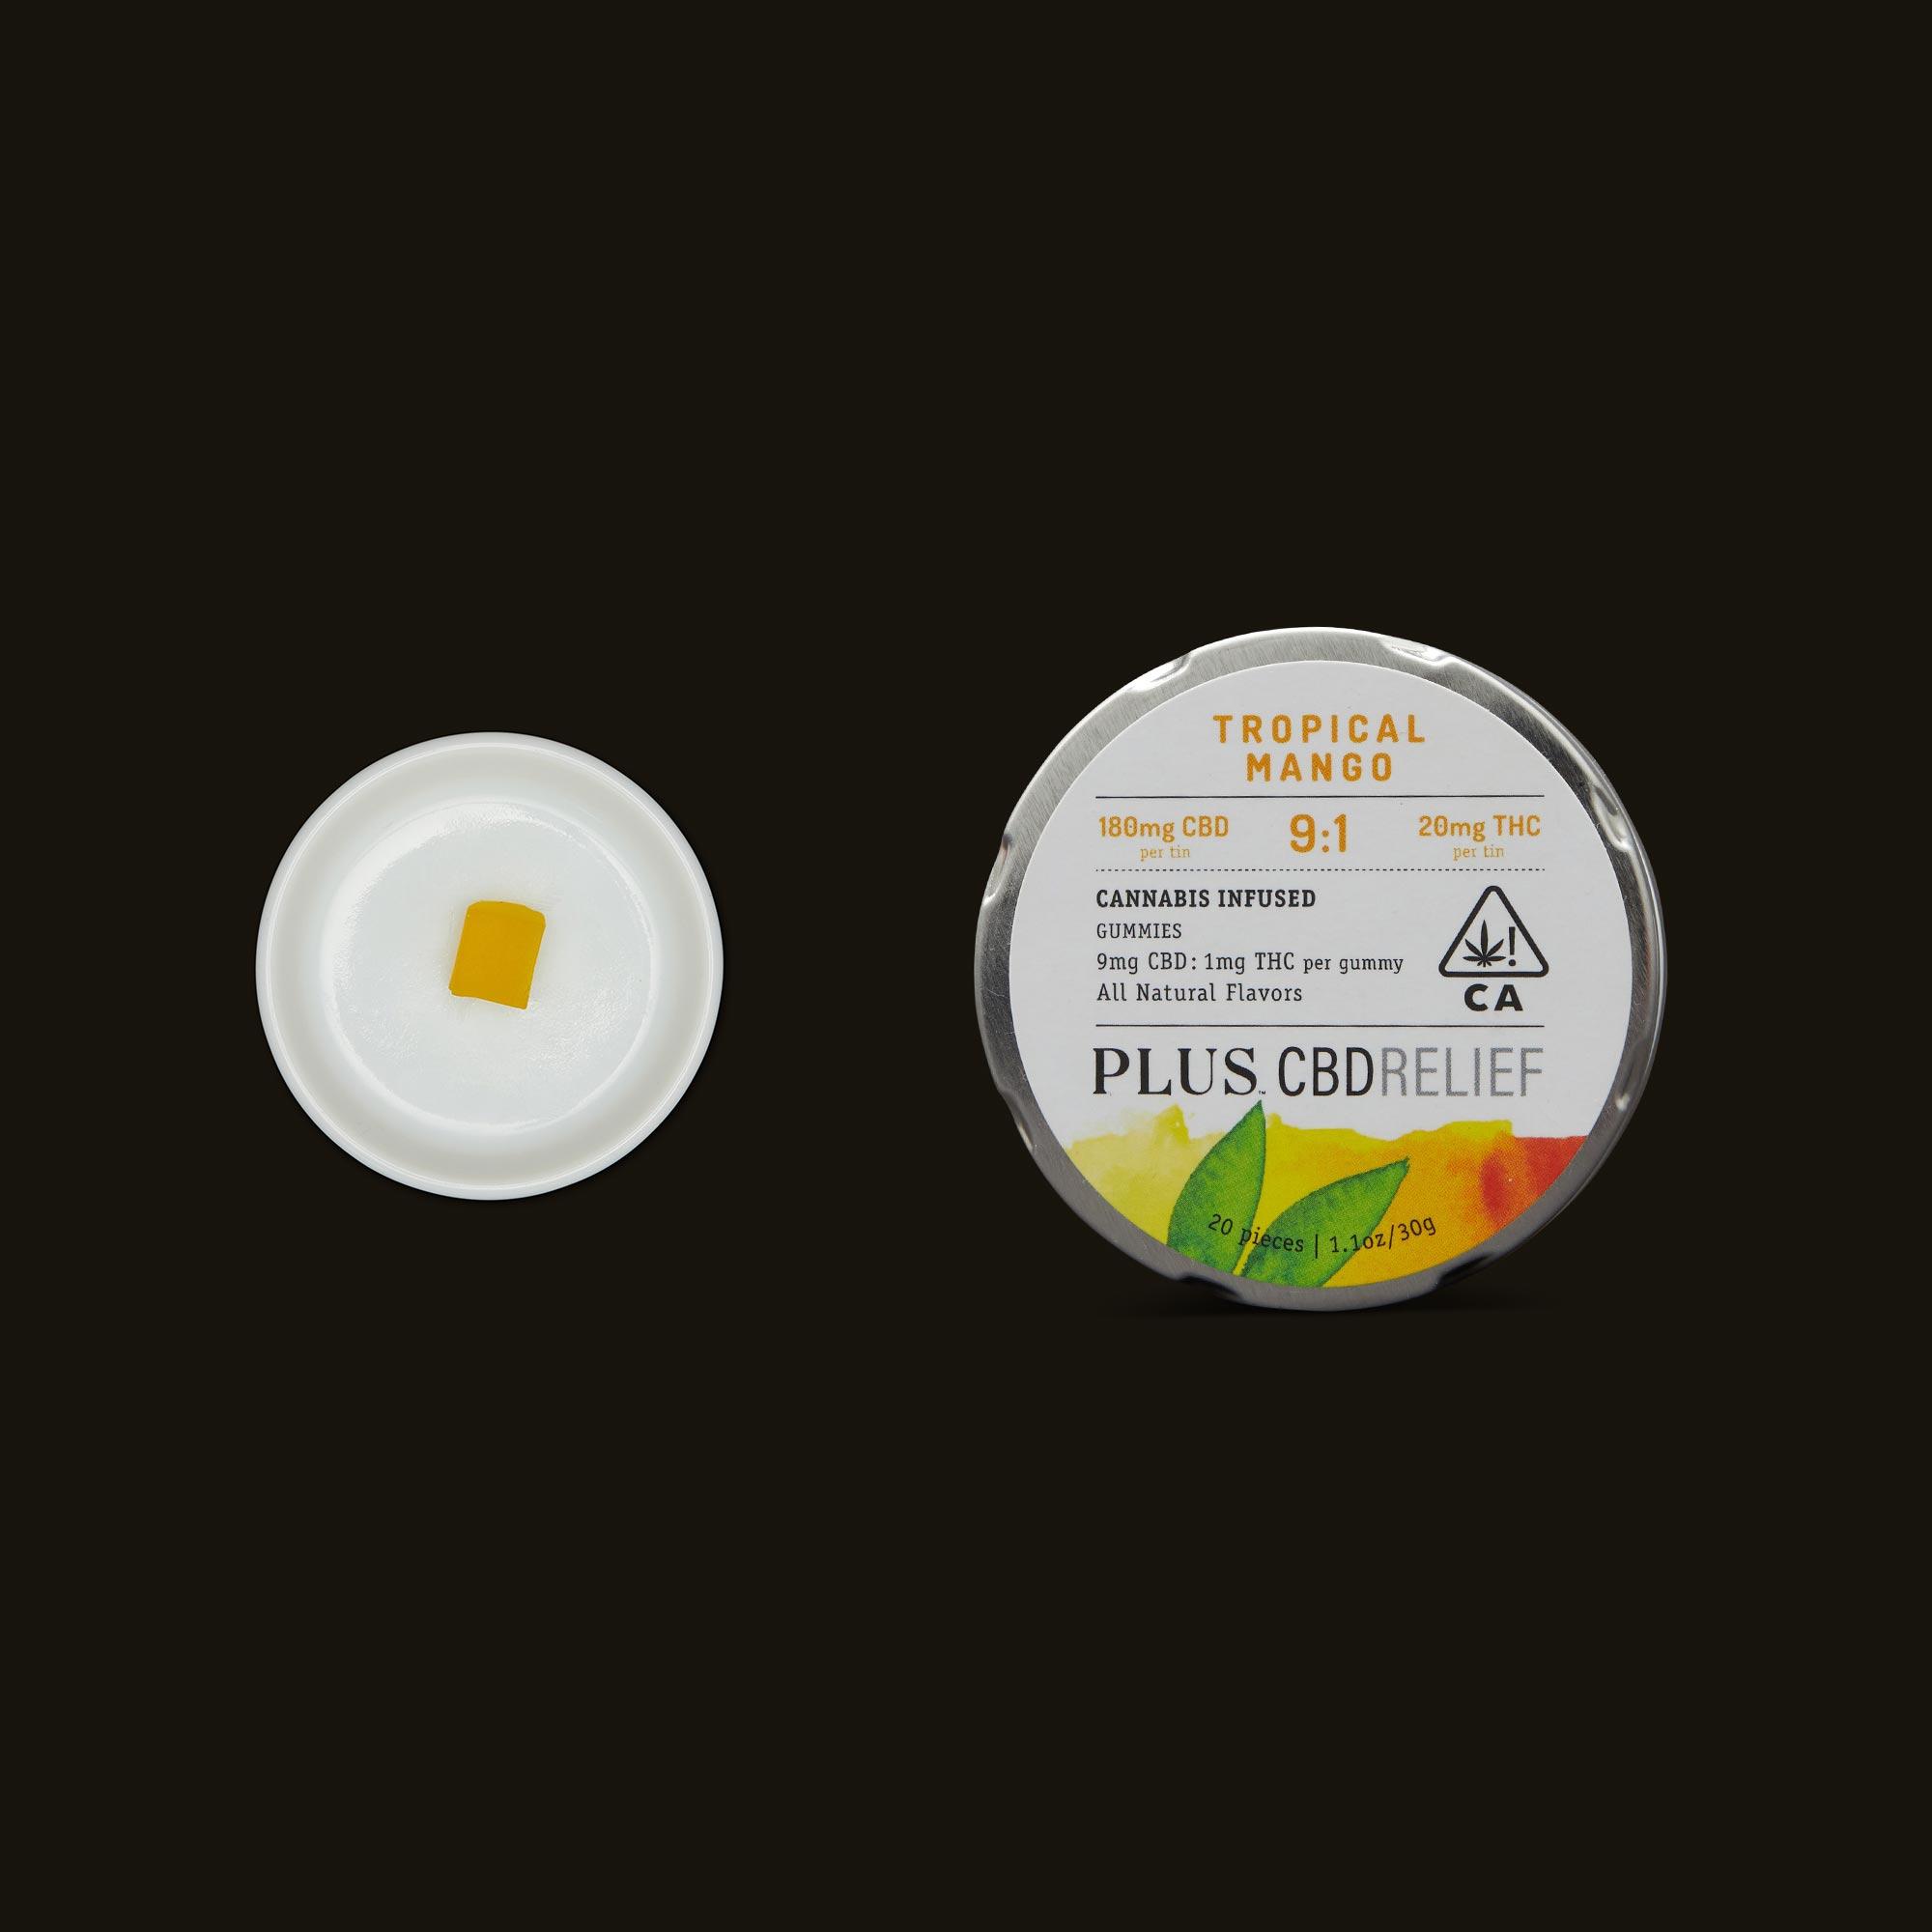 Plus CBD Relief 9:1 Tropical Mango Gummies